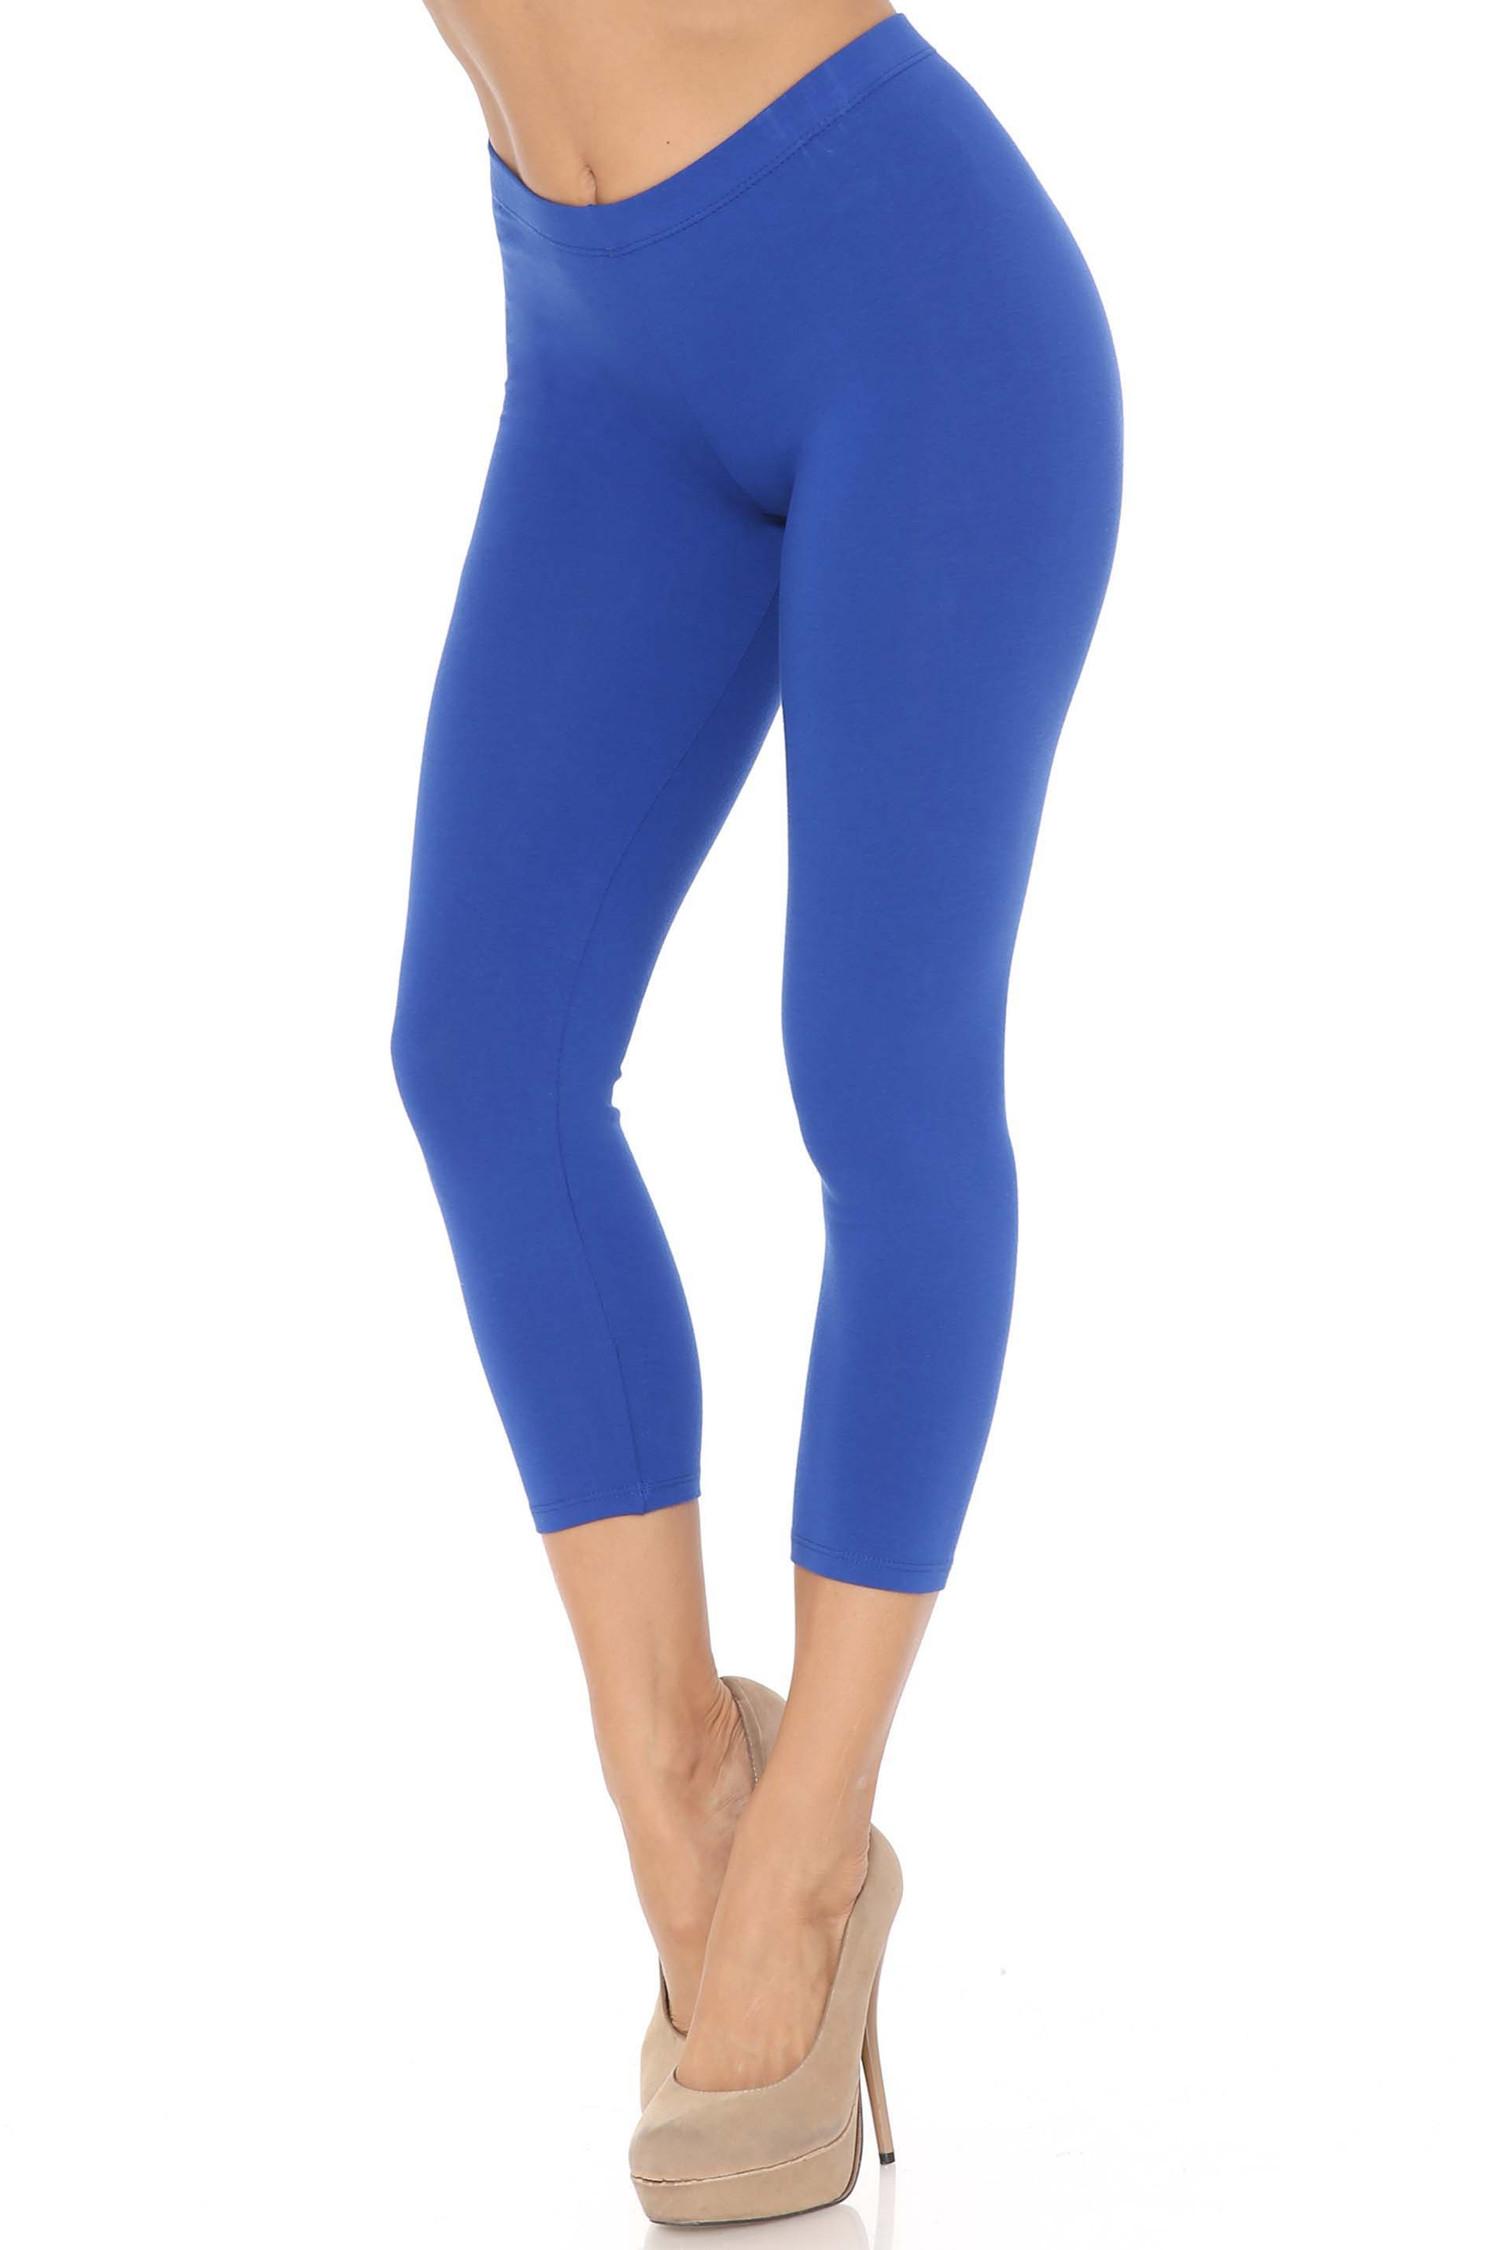 45 degree angle of blue USA Cotton Capri Length Leggings